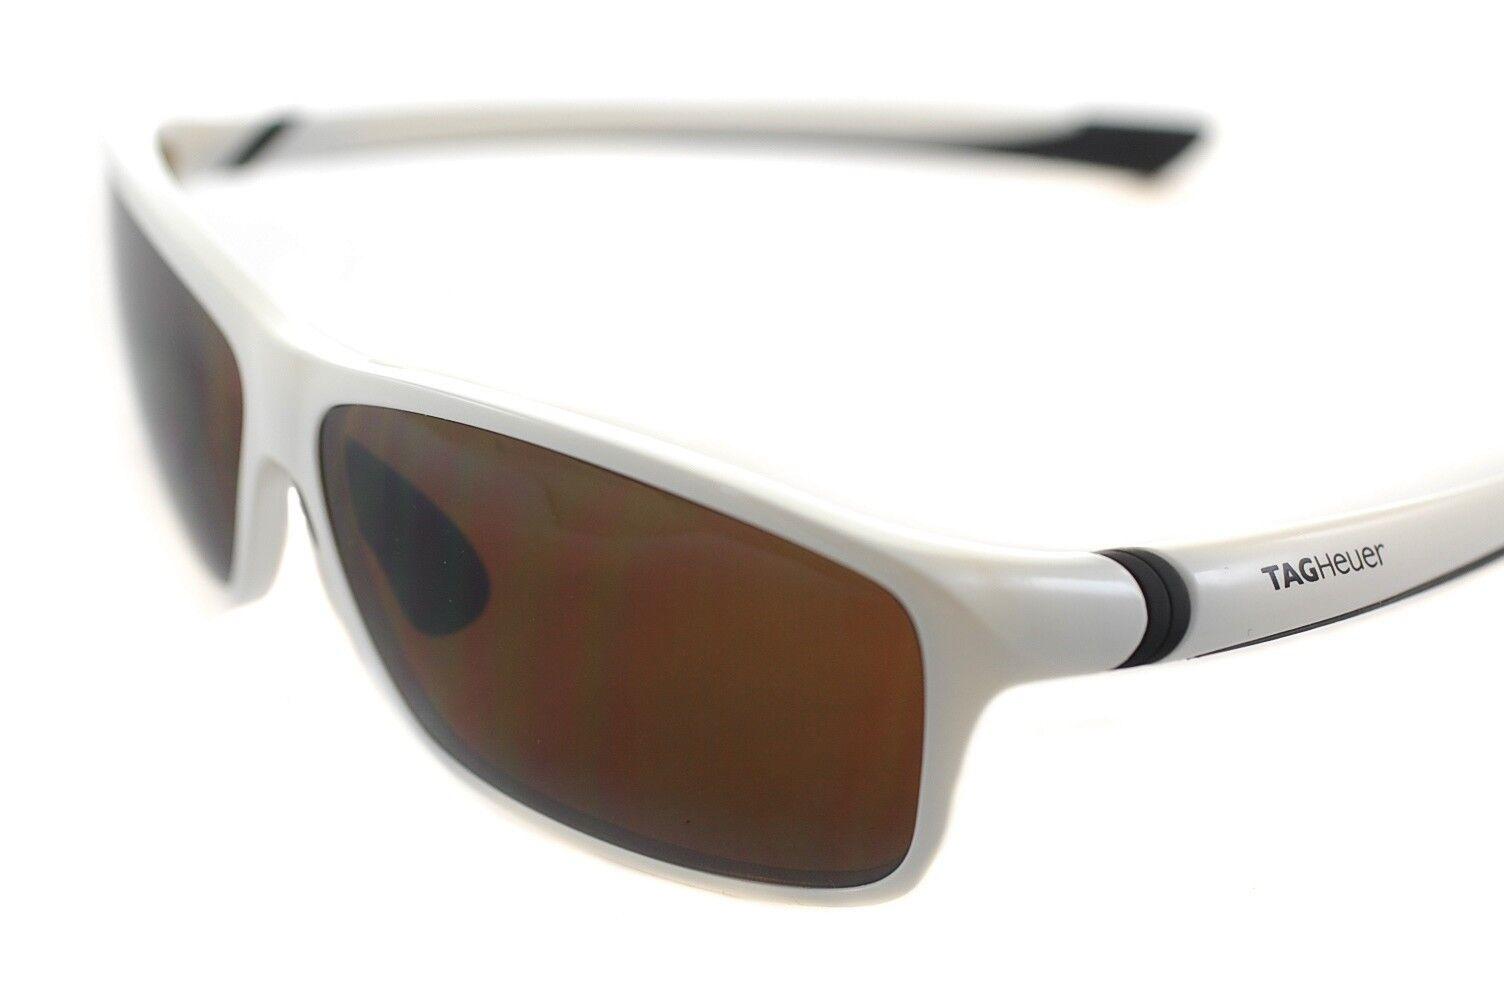 TAG Heuer 27 Degree HIGH MOUNTAIN POLARIZED 6024 107 Mens Sunglasses Weiß braun | Lebhaft und liebenswert